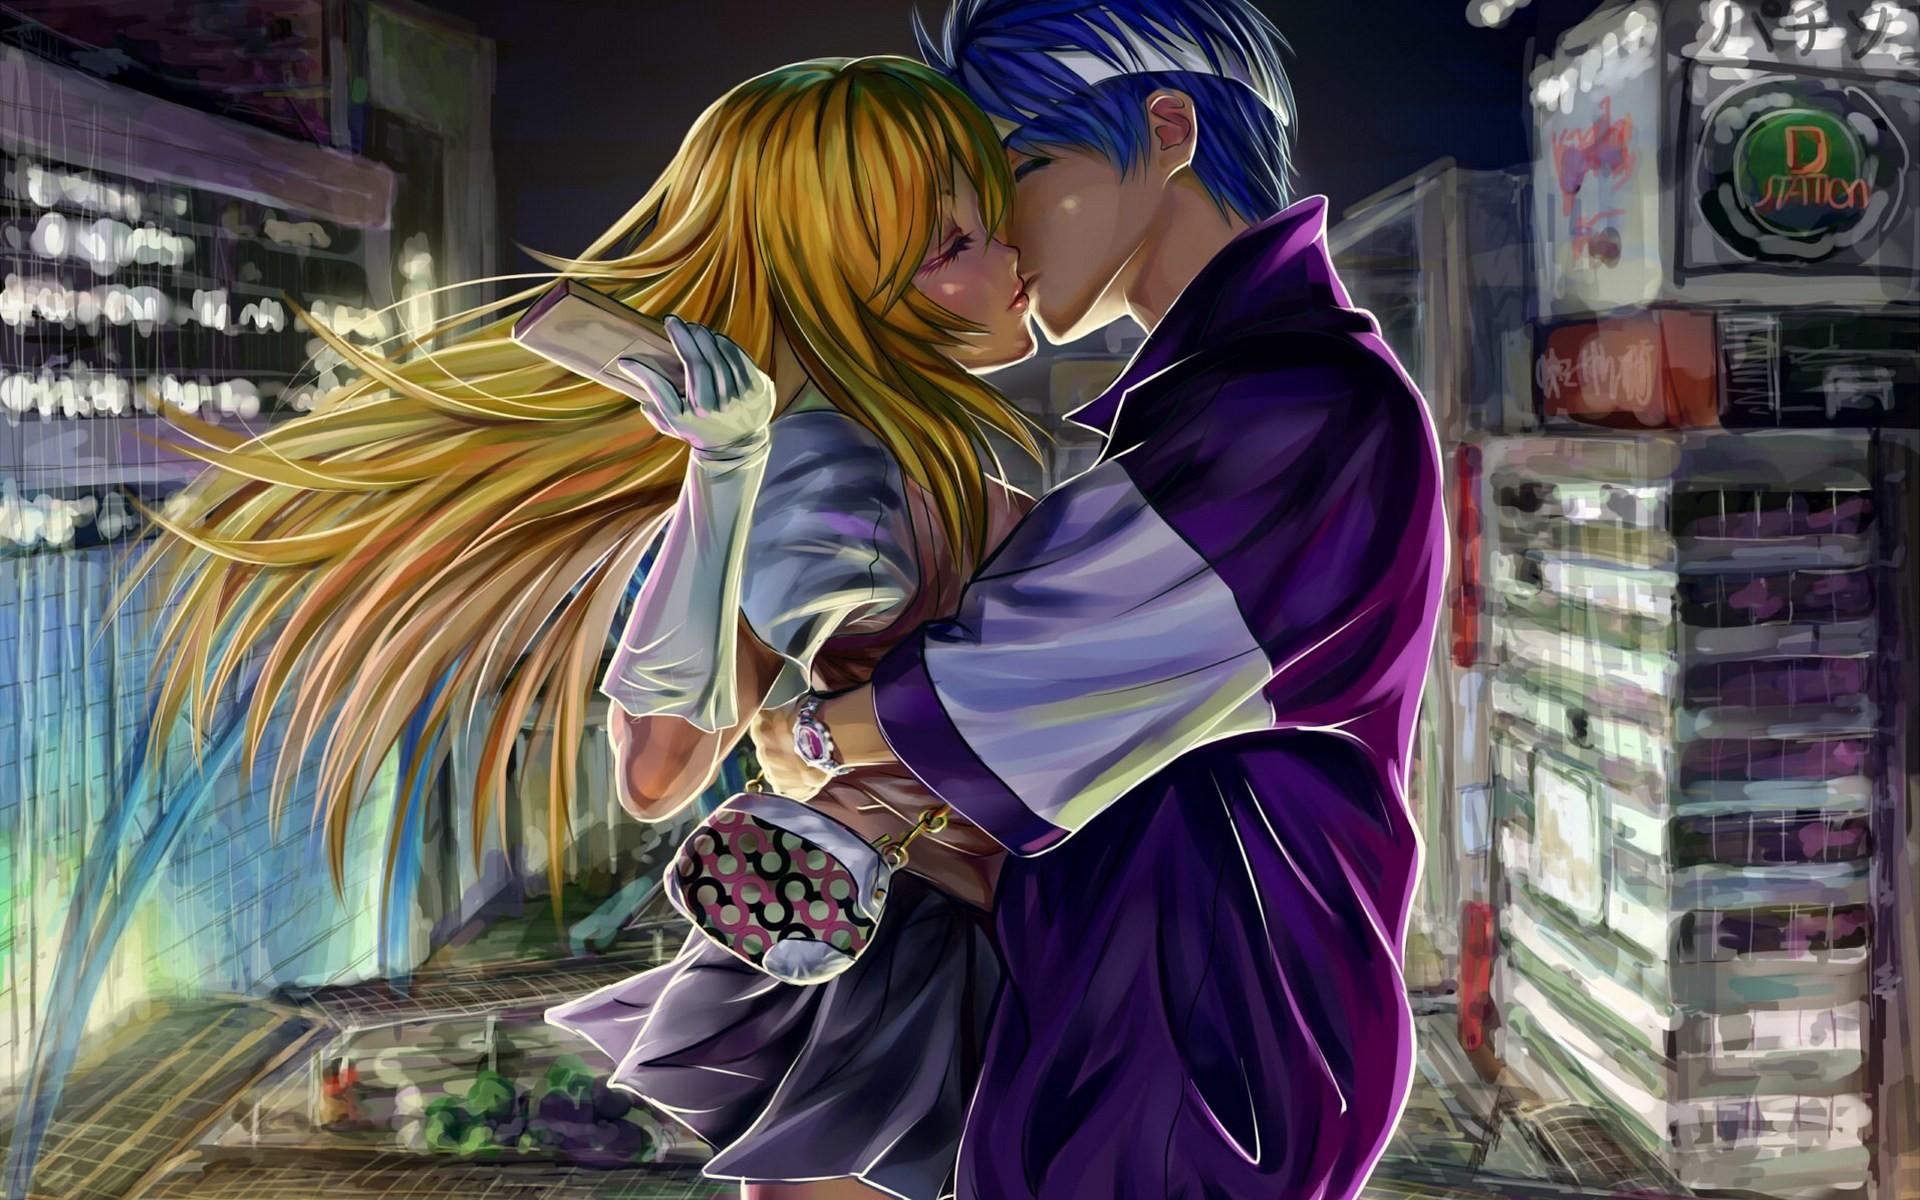 Wallpaper Anime Couple Kissing Comics Mythology Shokuhou Misaki Screenshot Mangaka Comic Book Toaru Kagaku No Railgun 1920x1200 Coolwallpapers 567247 Hd Wallpapers Wallhere